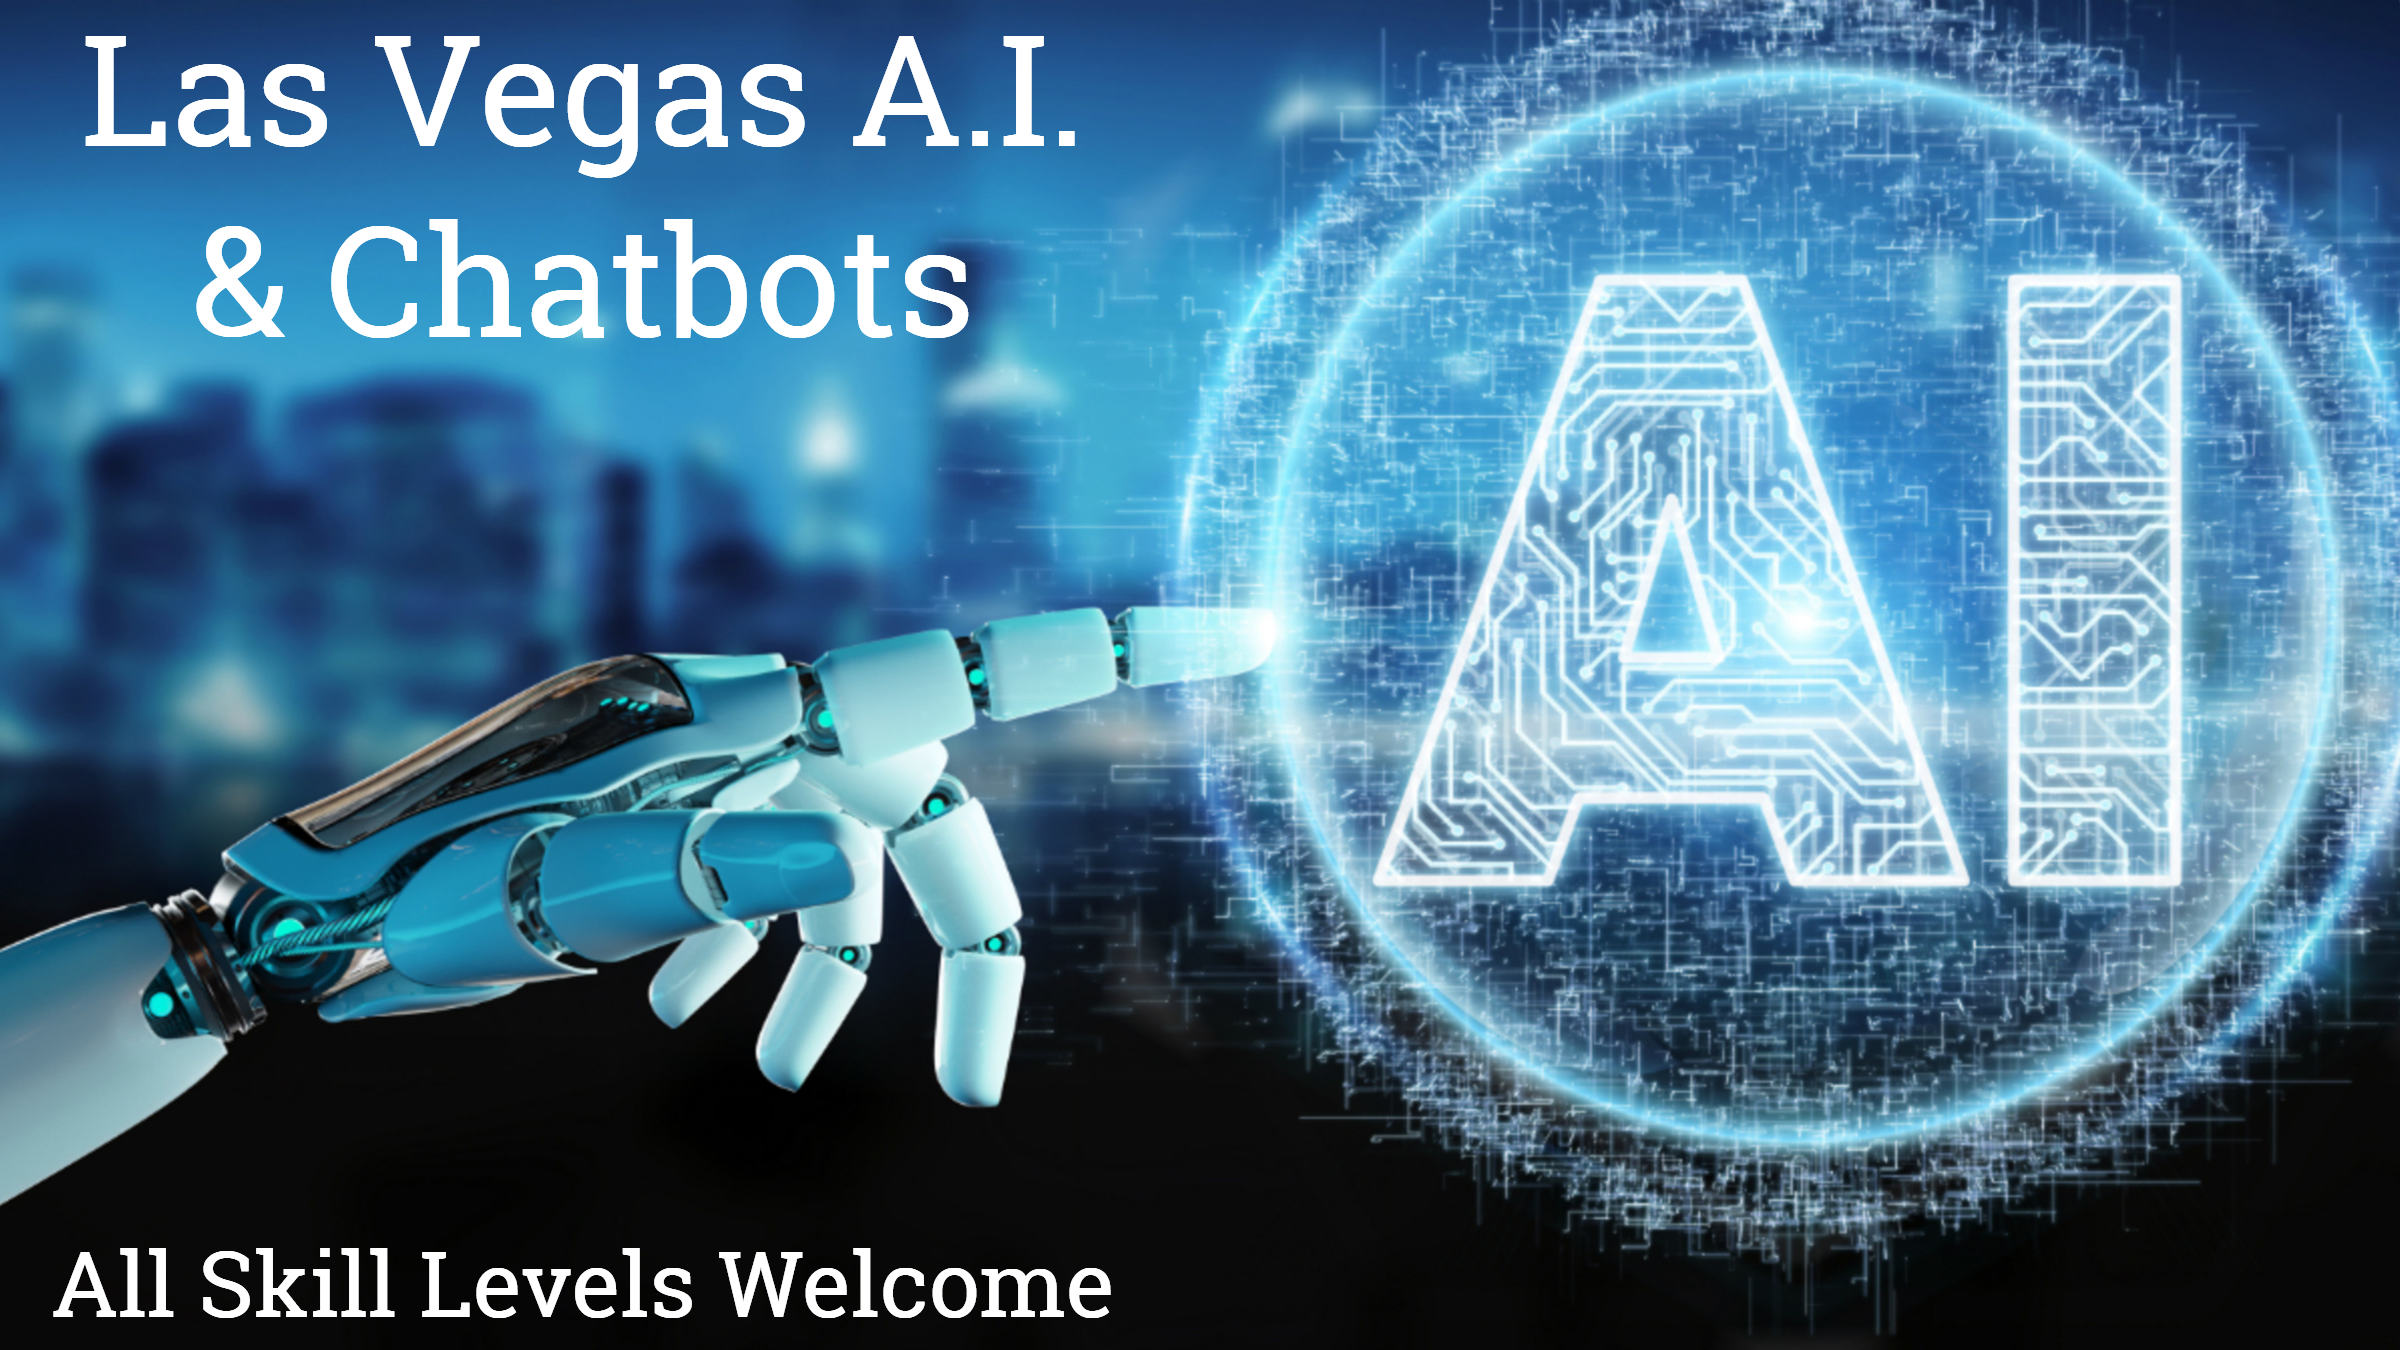 Las Vegas A.I. & Chatbots